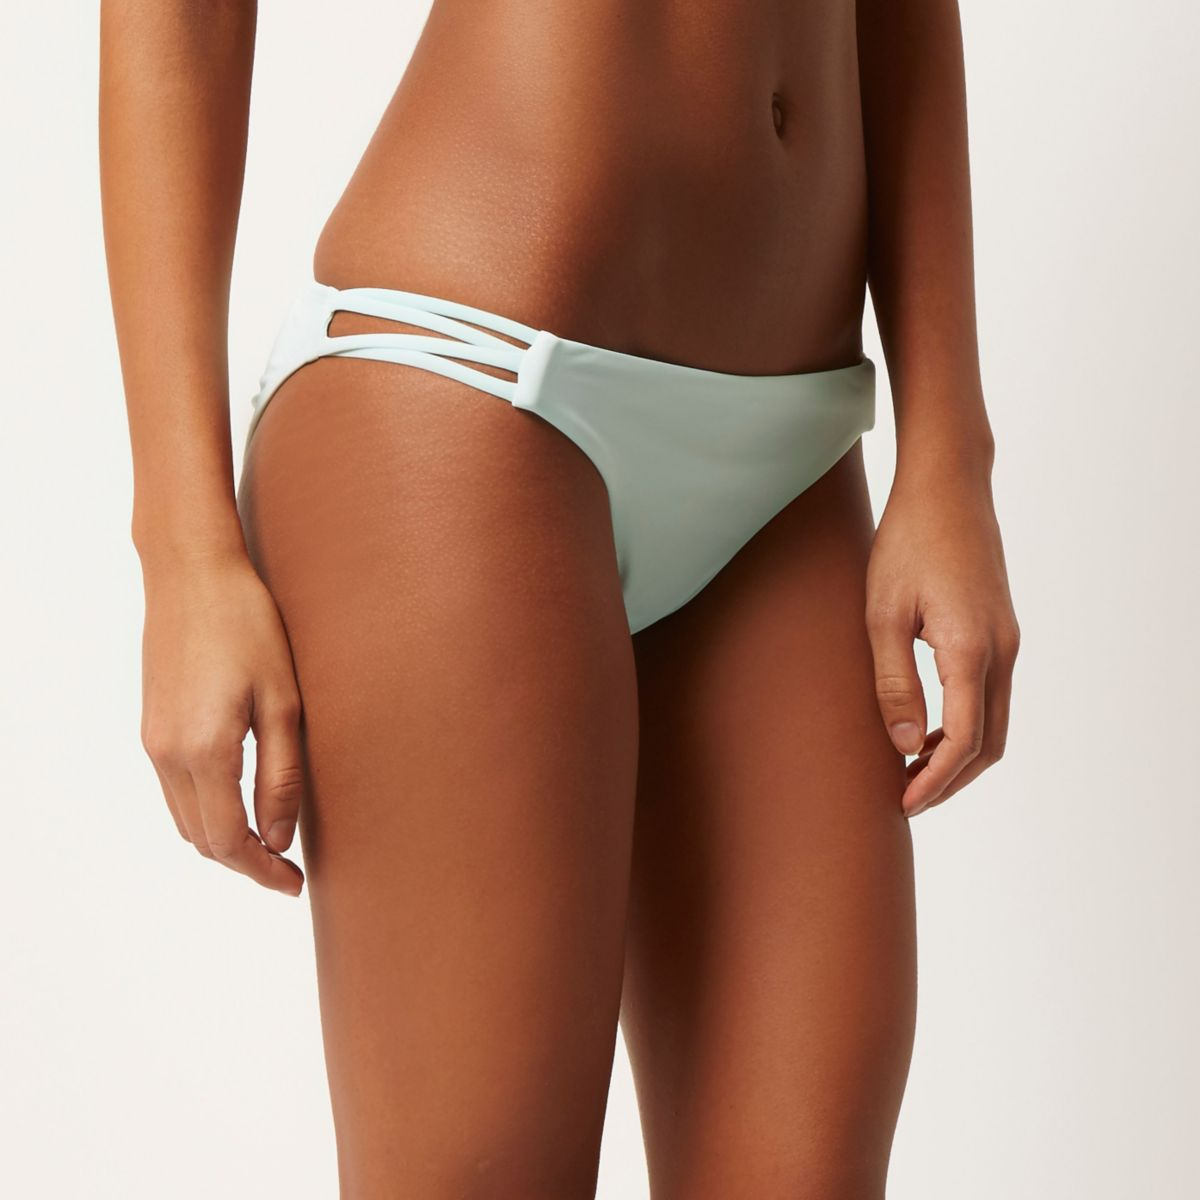 Light green low rise bikini bottoms